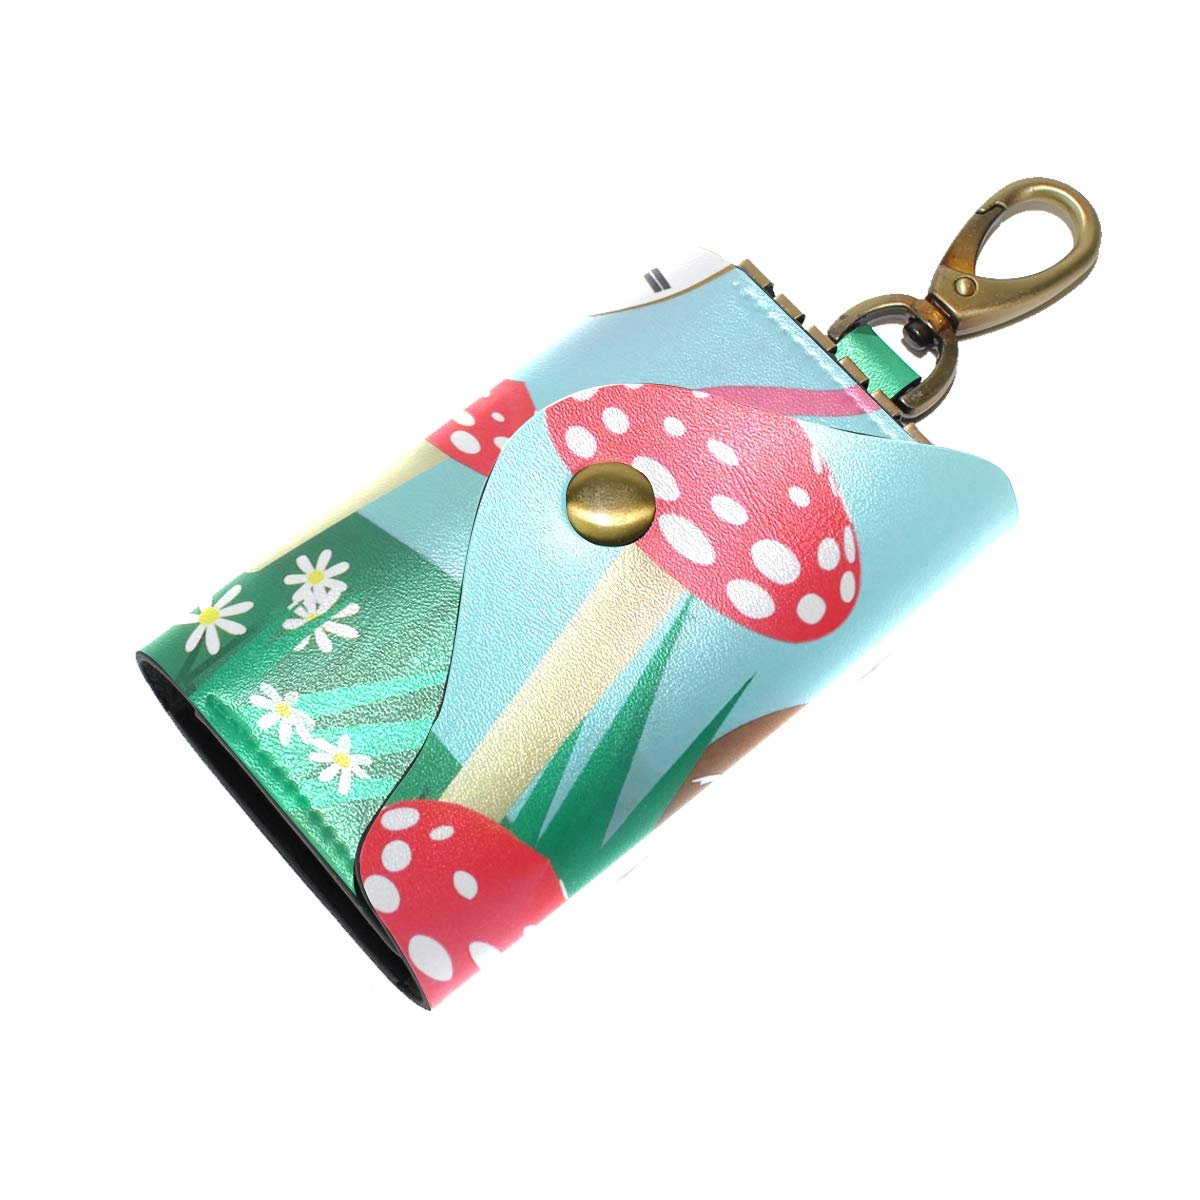 KEAKIA Cute Cartoon Leather Key Case Wallets Tri-fold Key Holder Keychains with 6 Hooks 2 Slot Snap Closure for Men Women